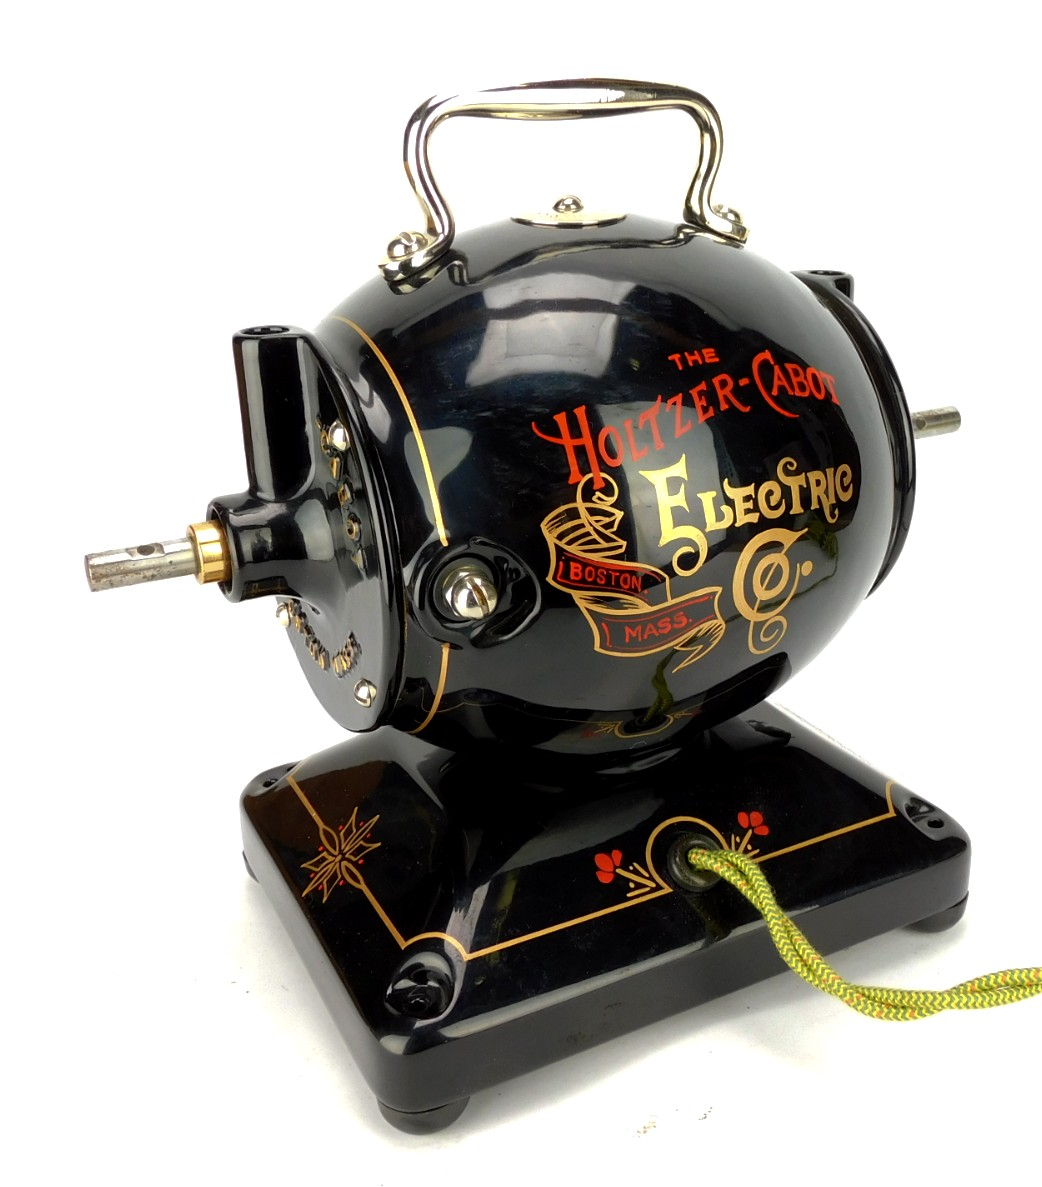 1915 Holtzer Cabot Utility Motor Restored